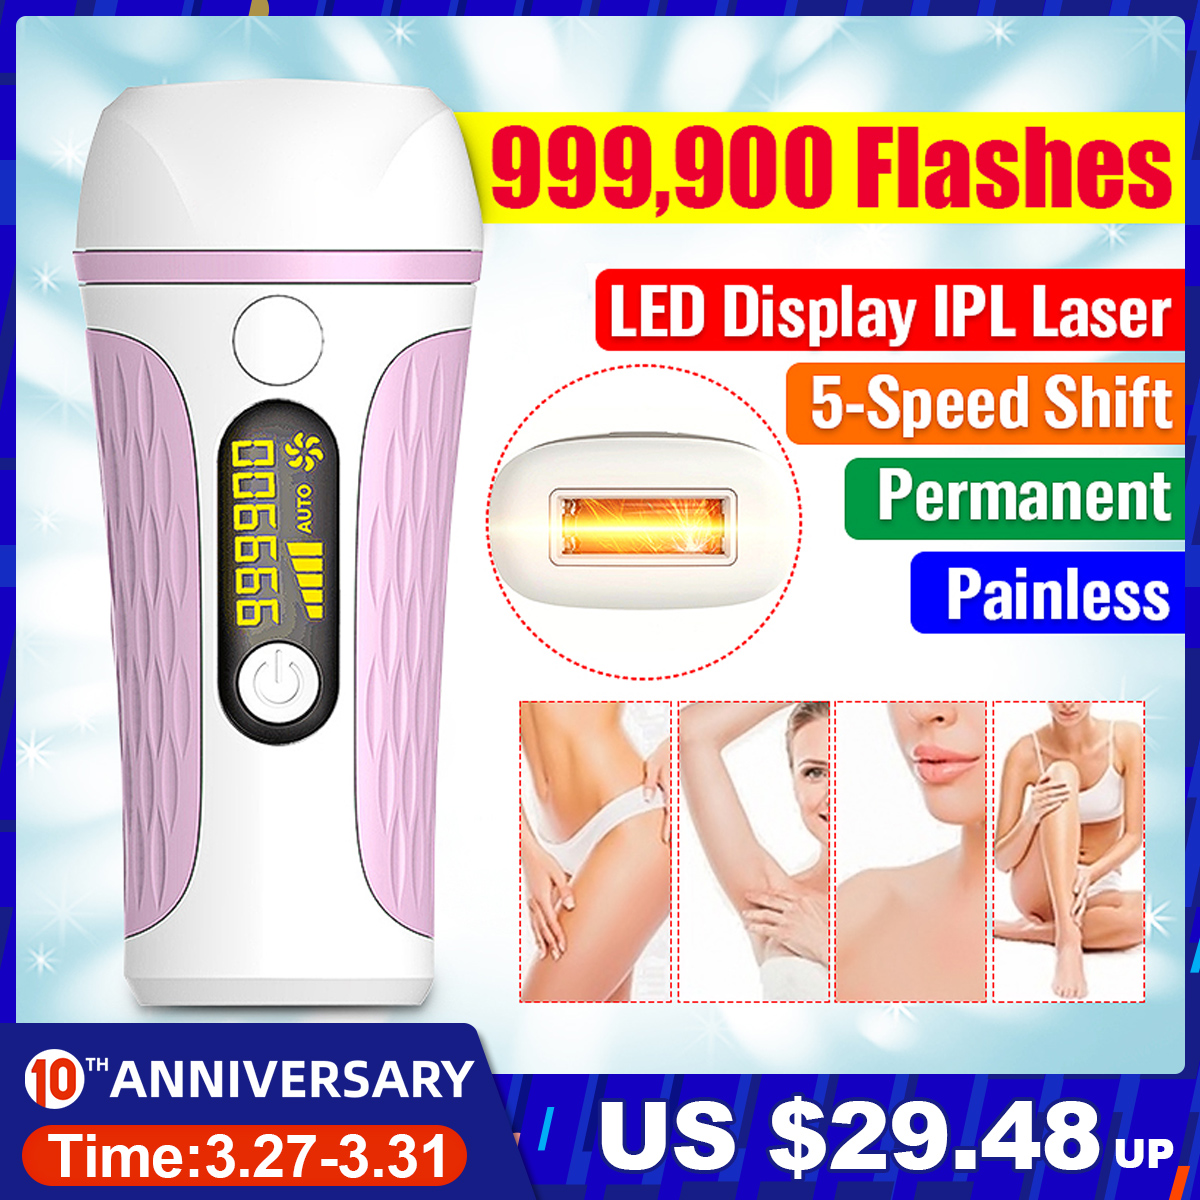 NEW 999,900 Flash Professional Permanent IPL Epilator Laser Hair Removal LCD Display Bikini Painless Hair Remover Machine